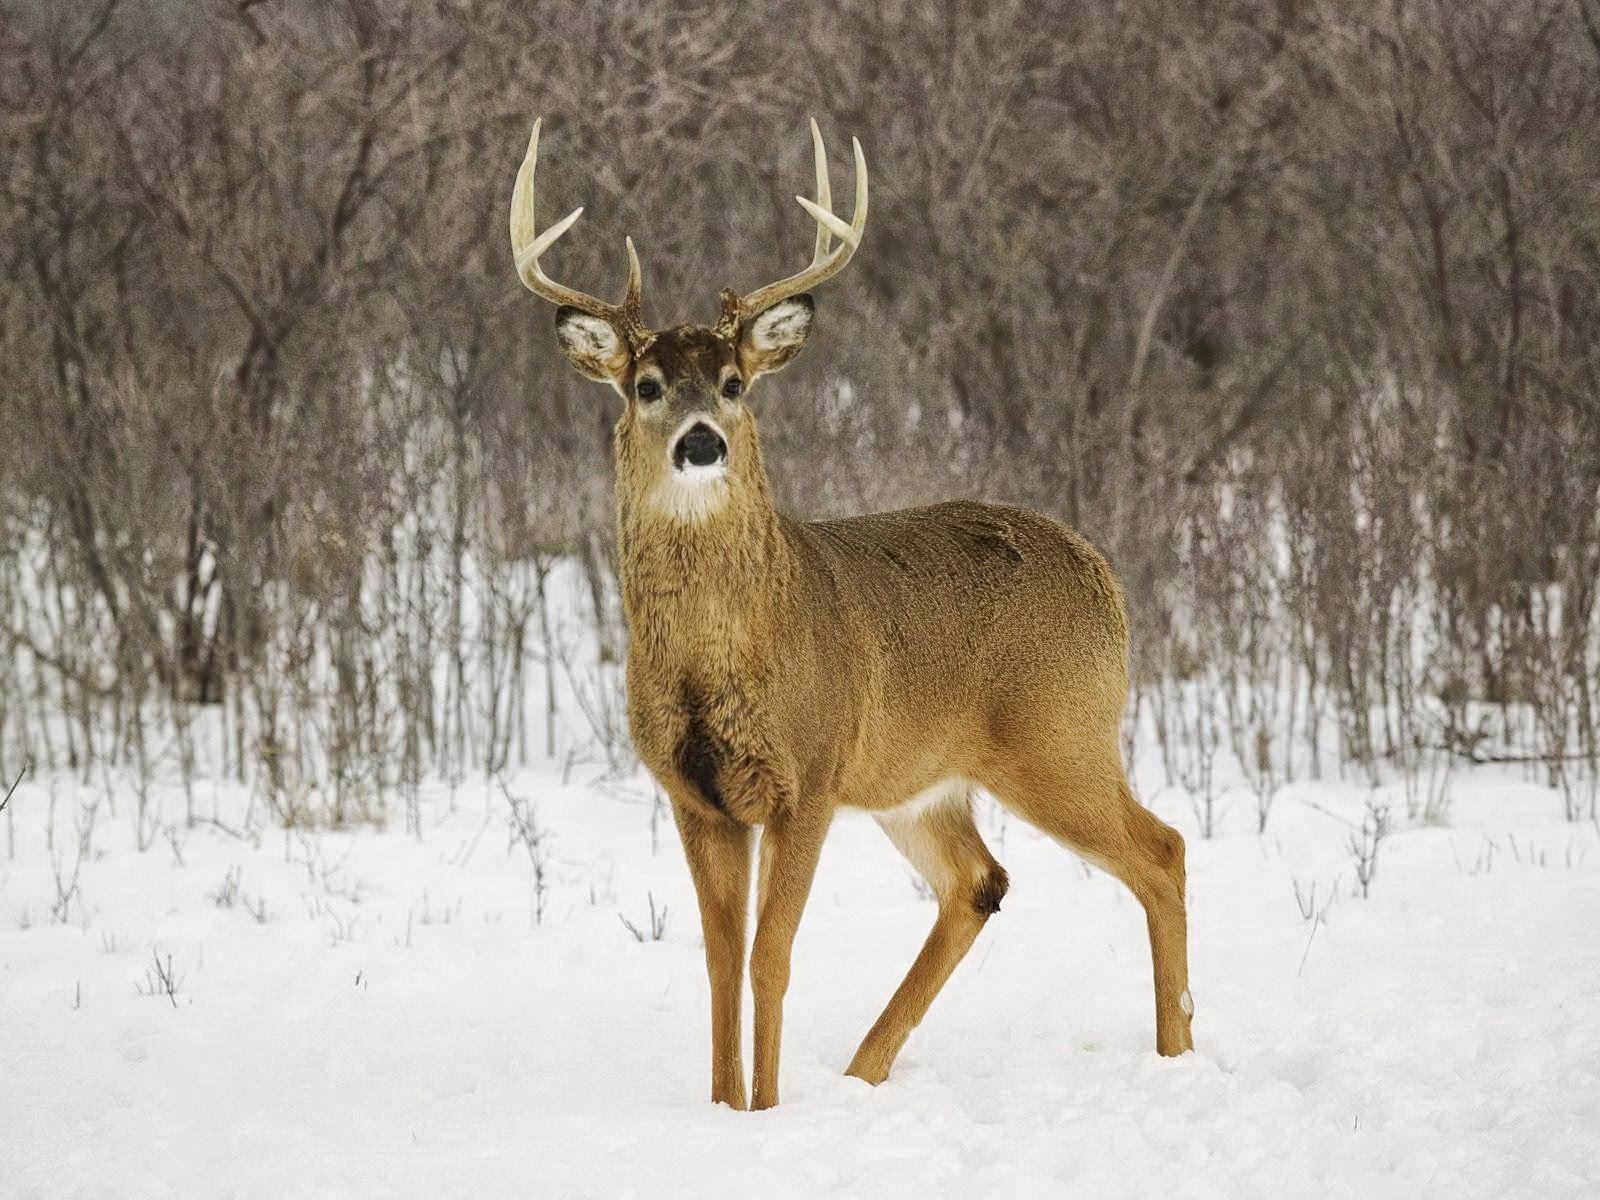 deer wallpaper deer wallpapers and pictures items page zoom